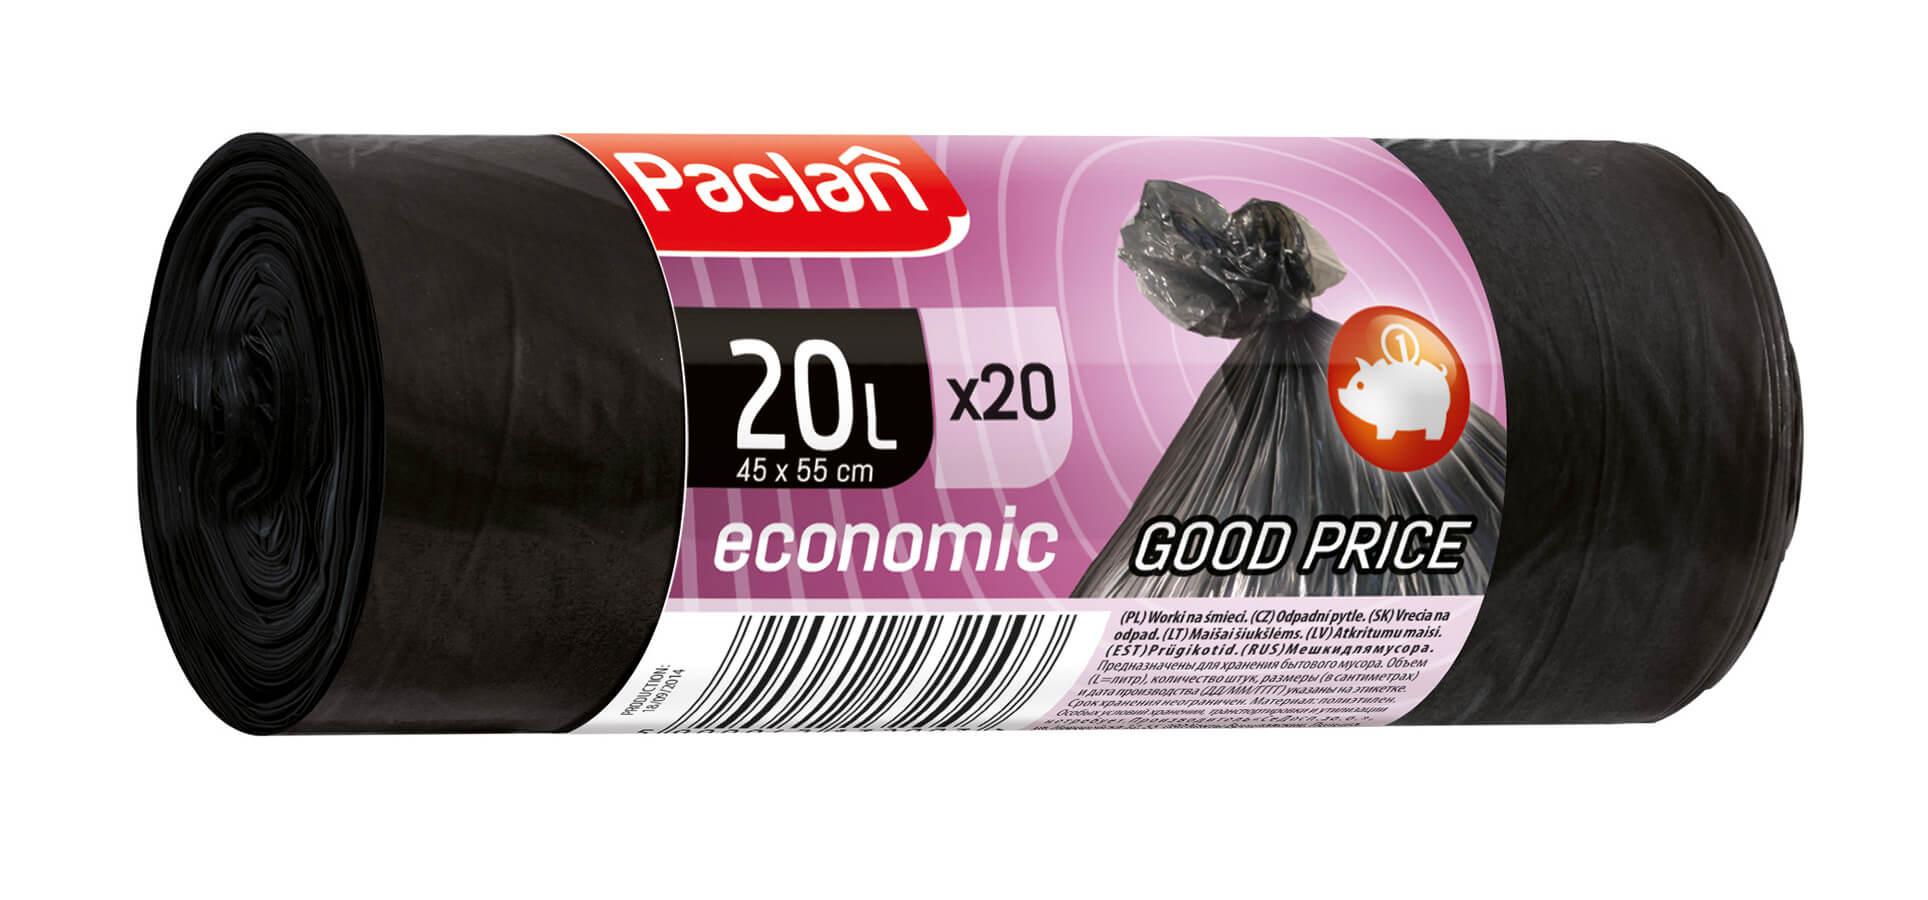 Paclan Economic vrecia na odpad 20l 20ks